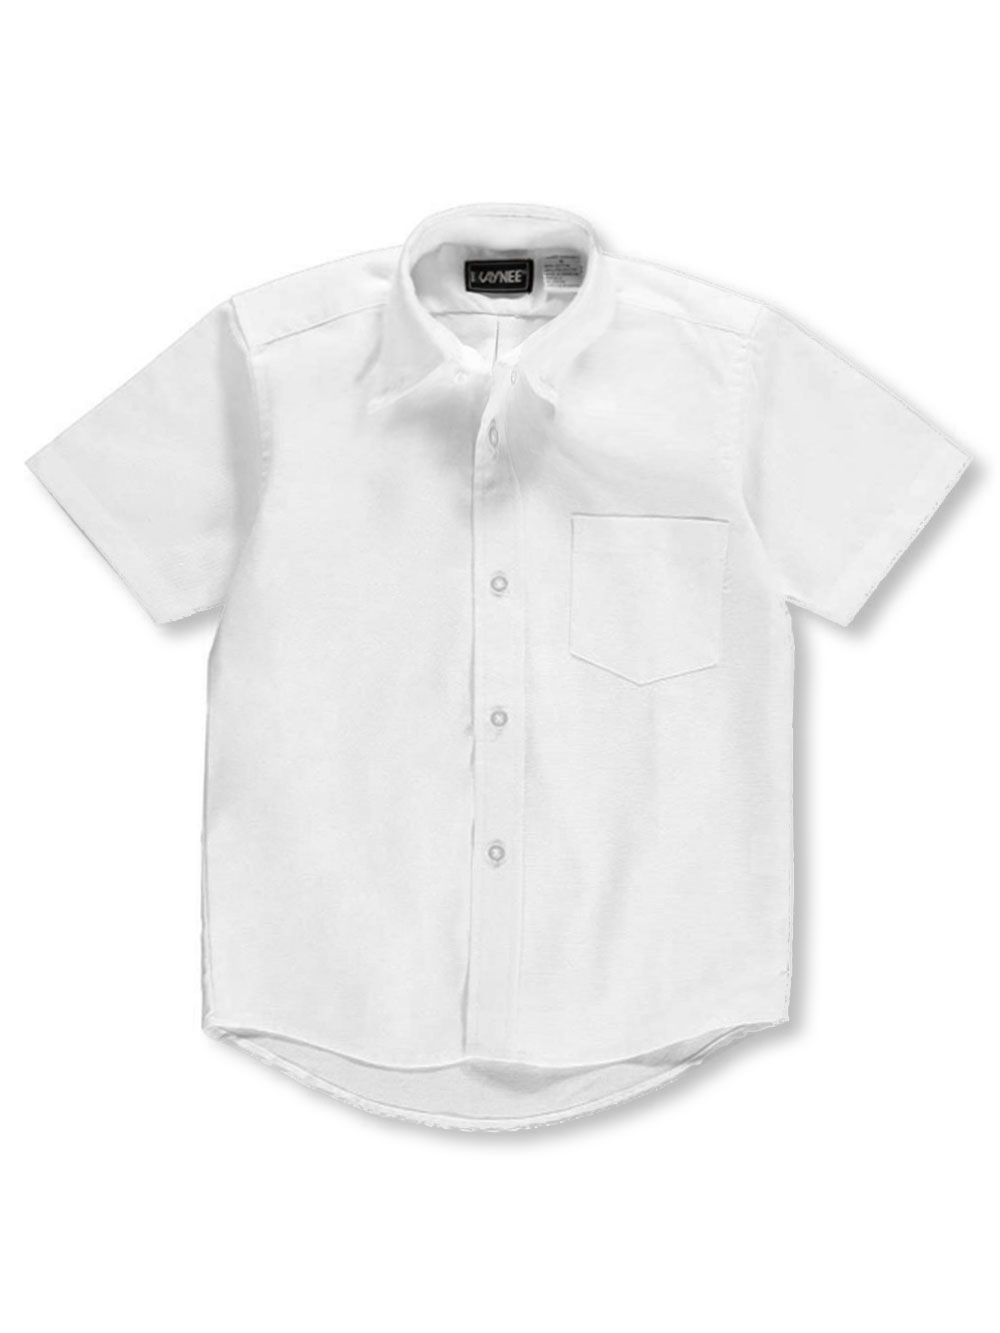 "Sizes 8-20 Rifle//Kaynee Unisex/' /""Nexpander/"" S//S Button-Down Shirt"